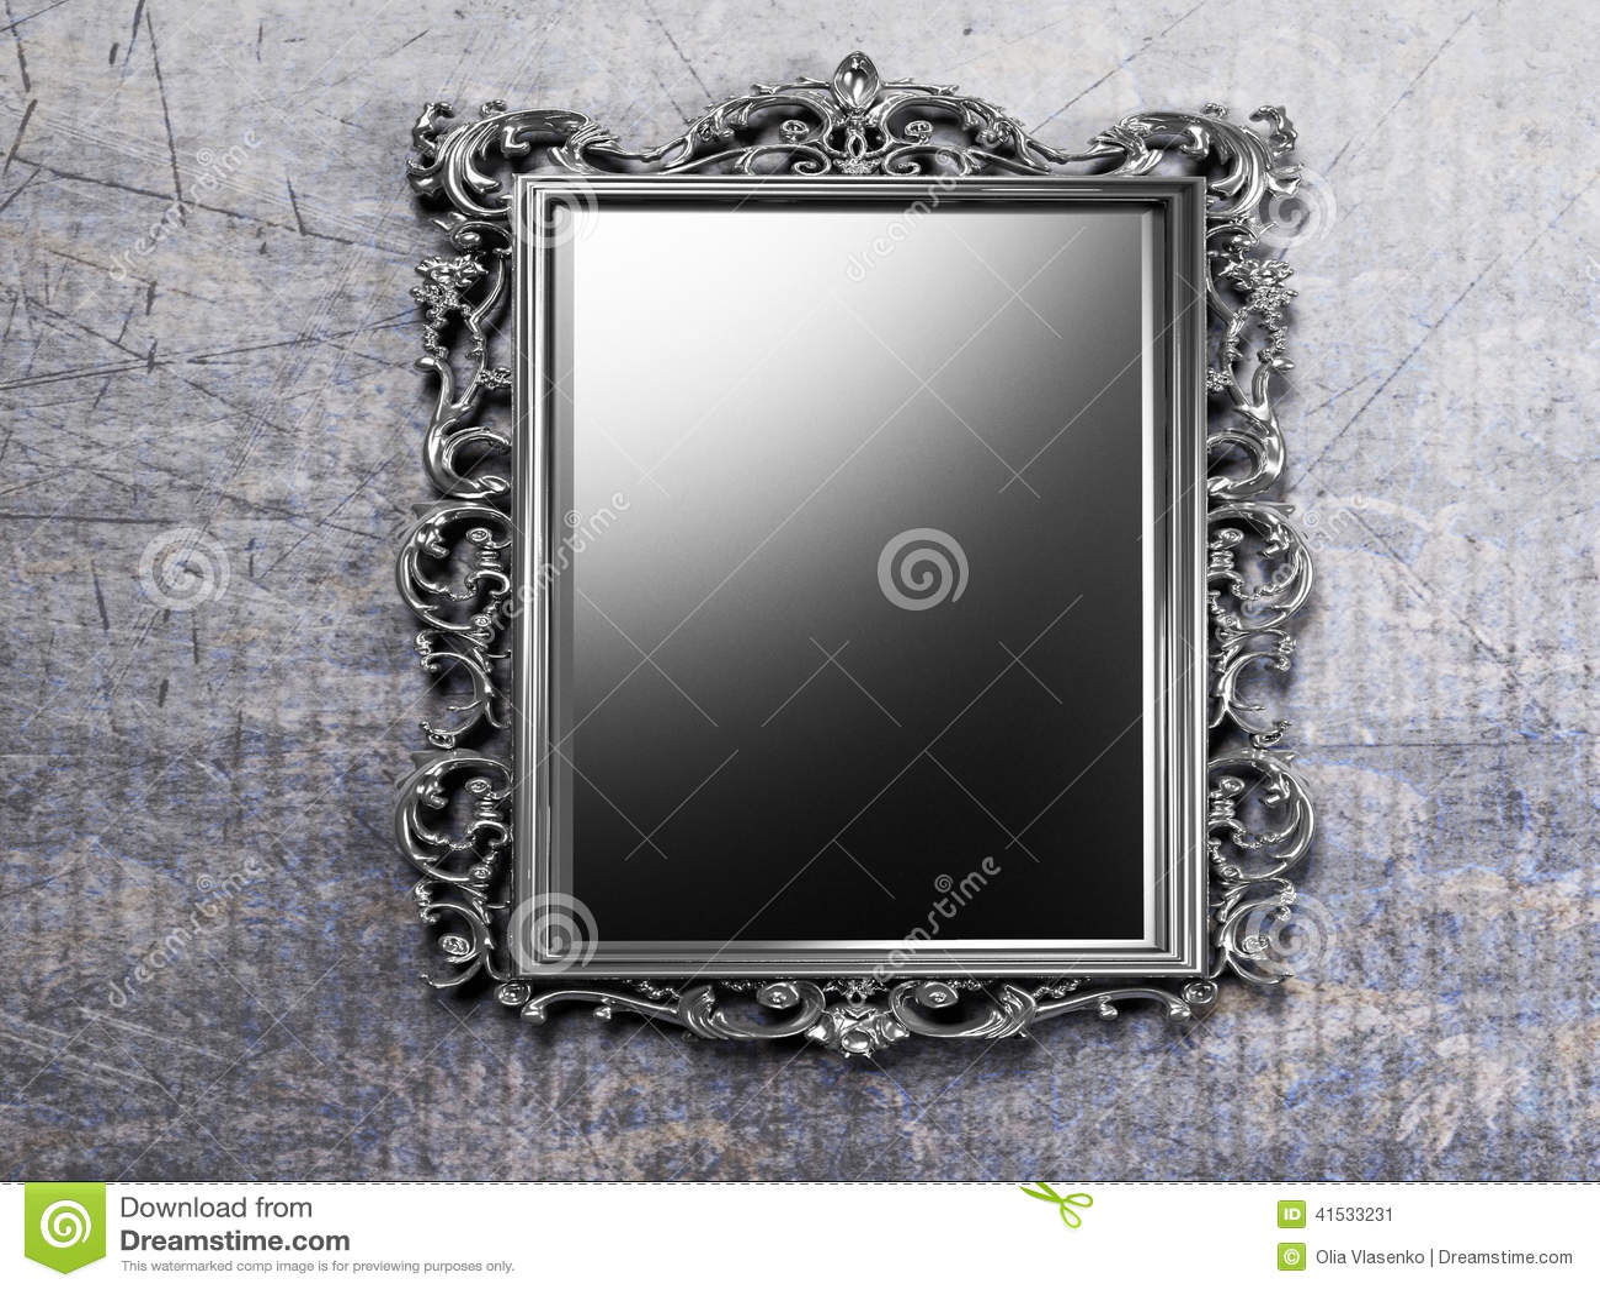 Stock illustration retro antique mirror wall rendering image41533231